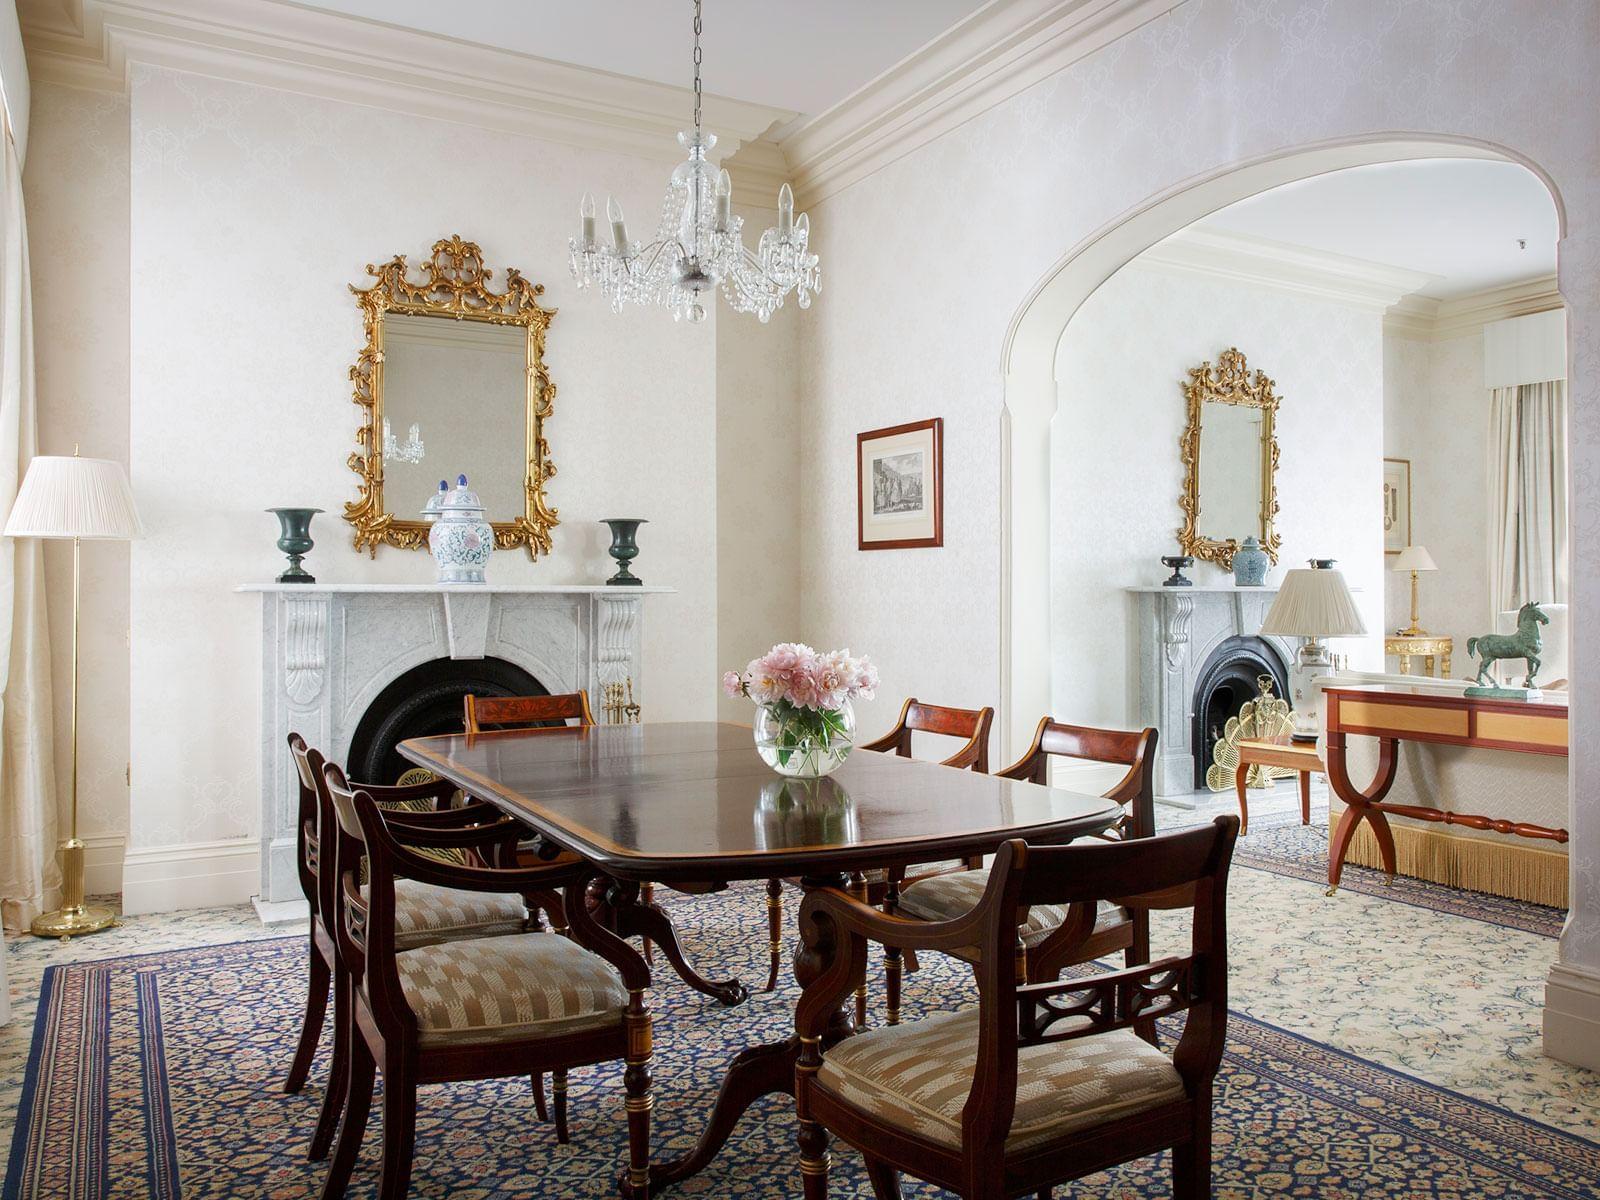 Royal Suite Dining Room at The Hotel Windsor Melbourne